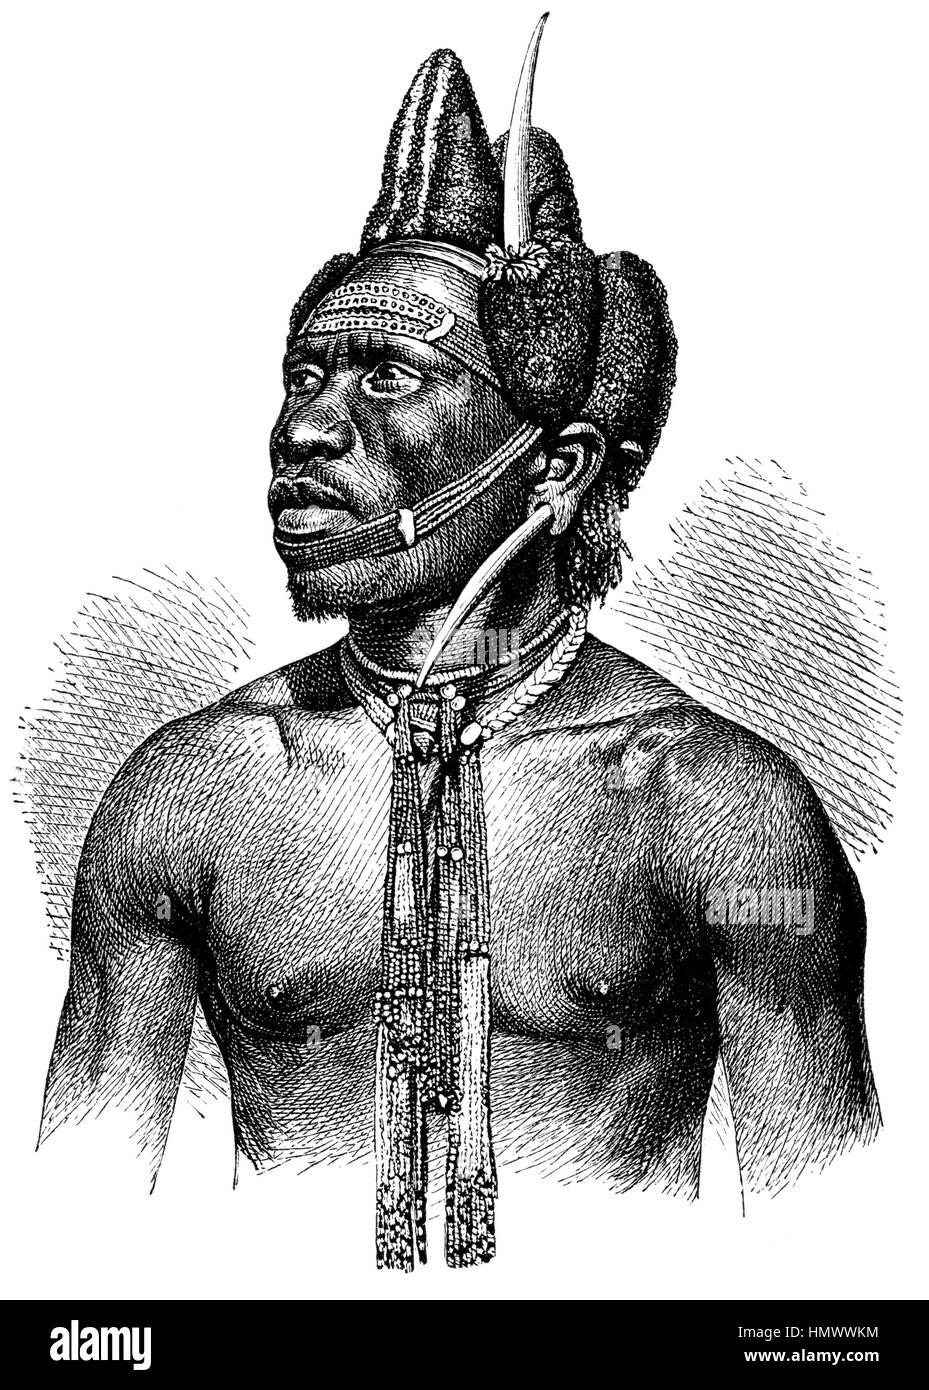 Pondo Warrior, Africa, Illustration, 1885 - Stock Image